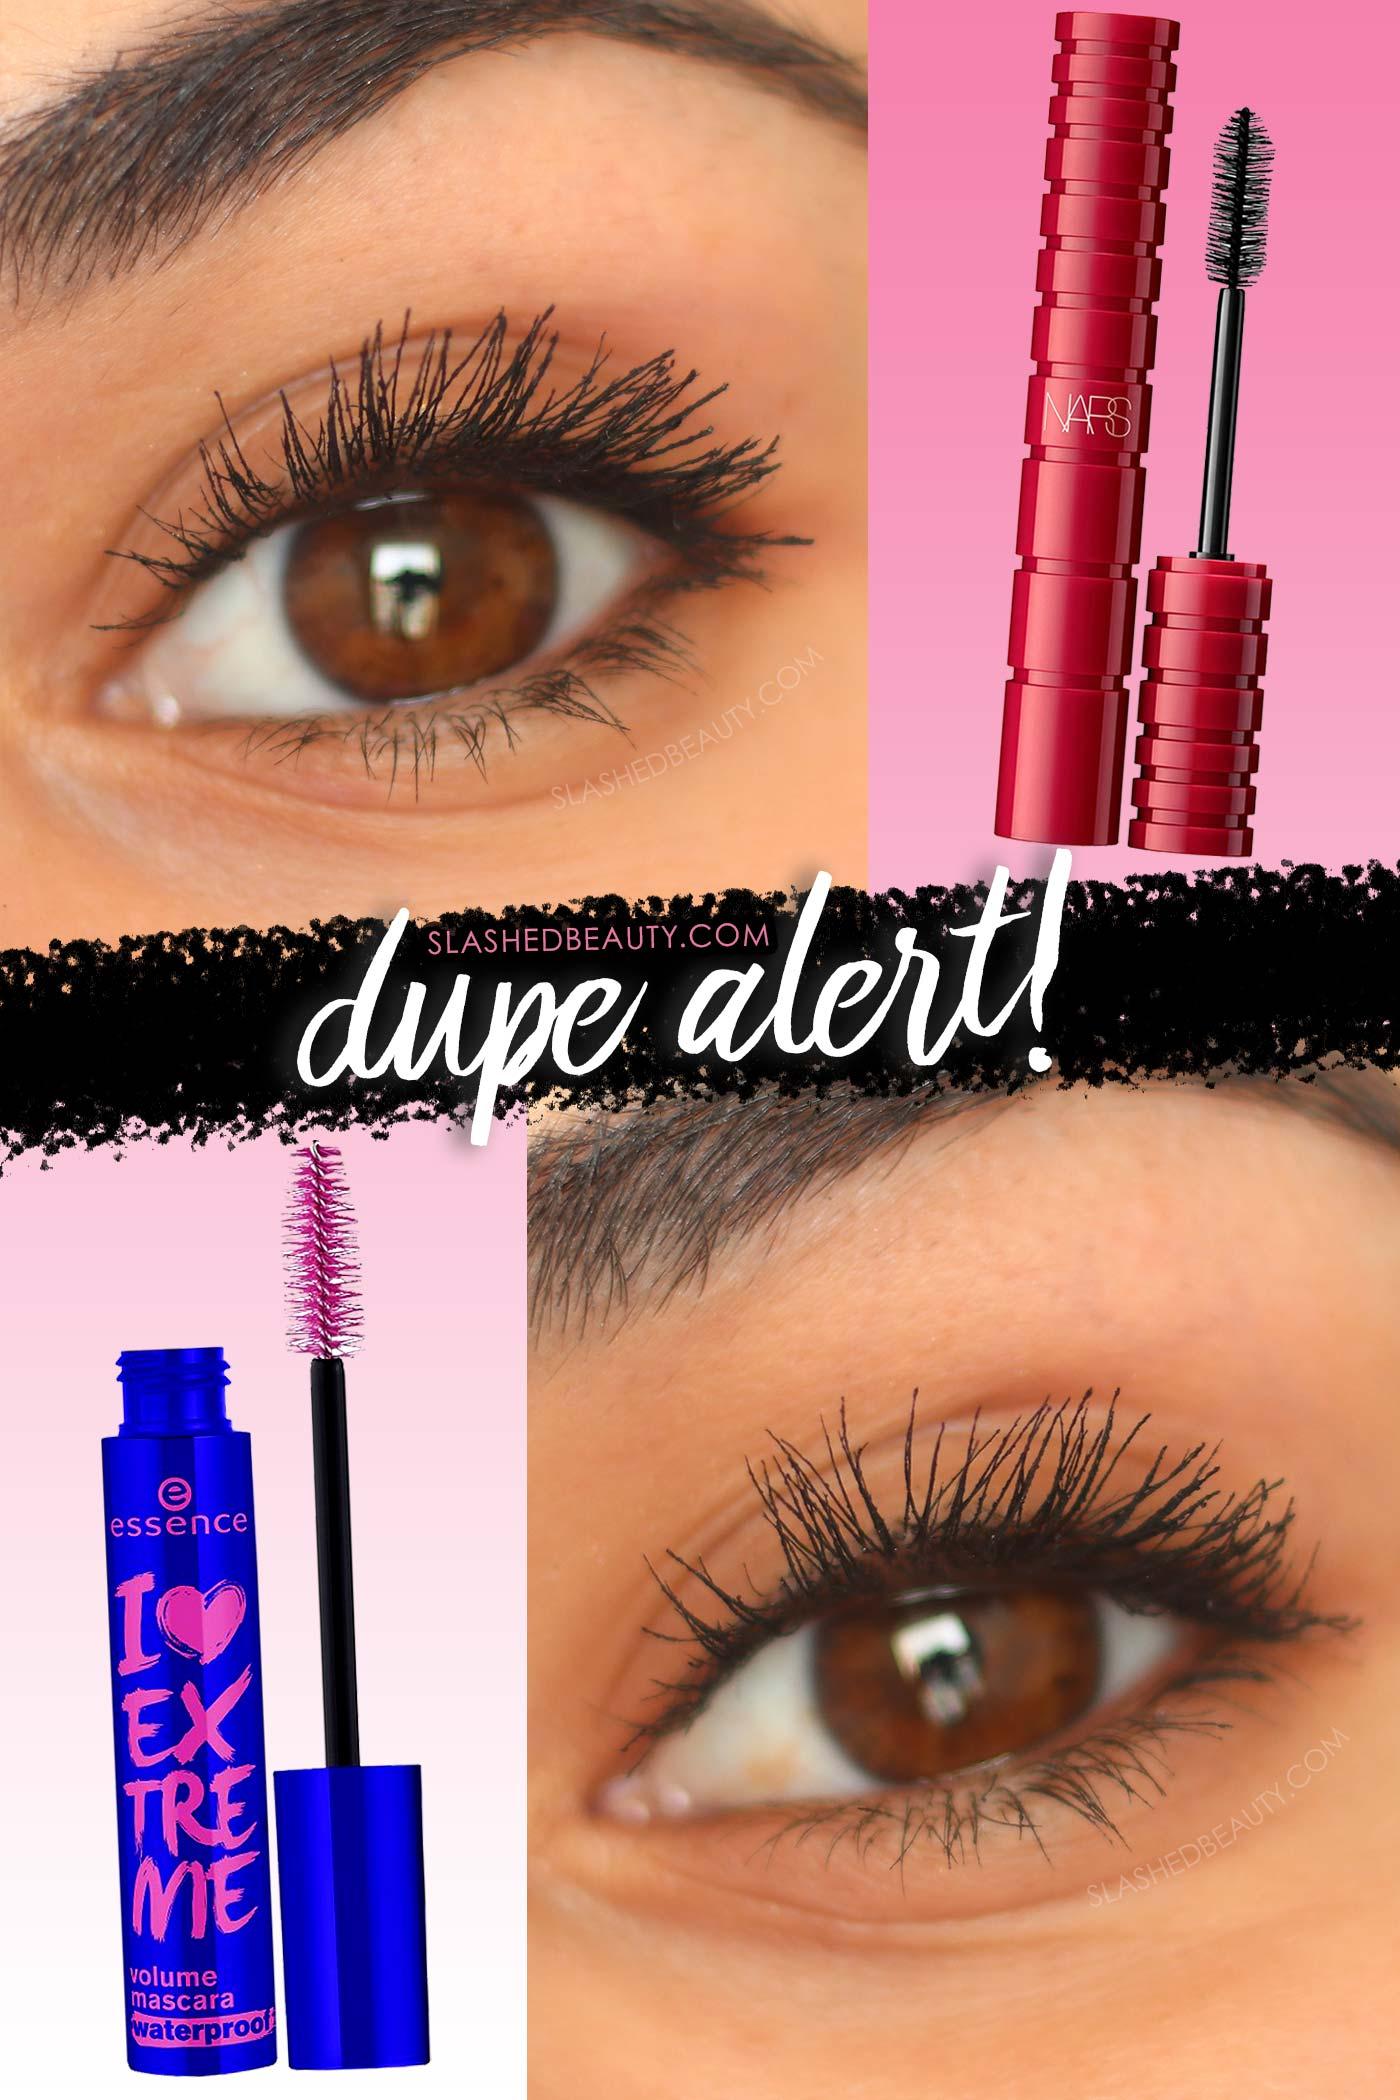 NARS Climax Mascara Dupe: Essence I Love Extreme Volume Mascara | Drugstore Mascara Dupe Comparison | Slashed Beauty